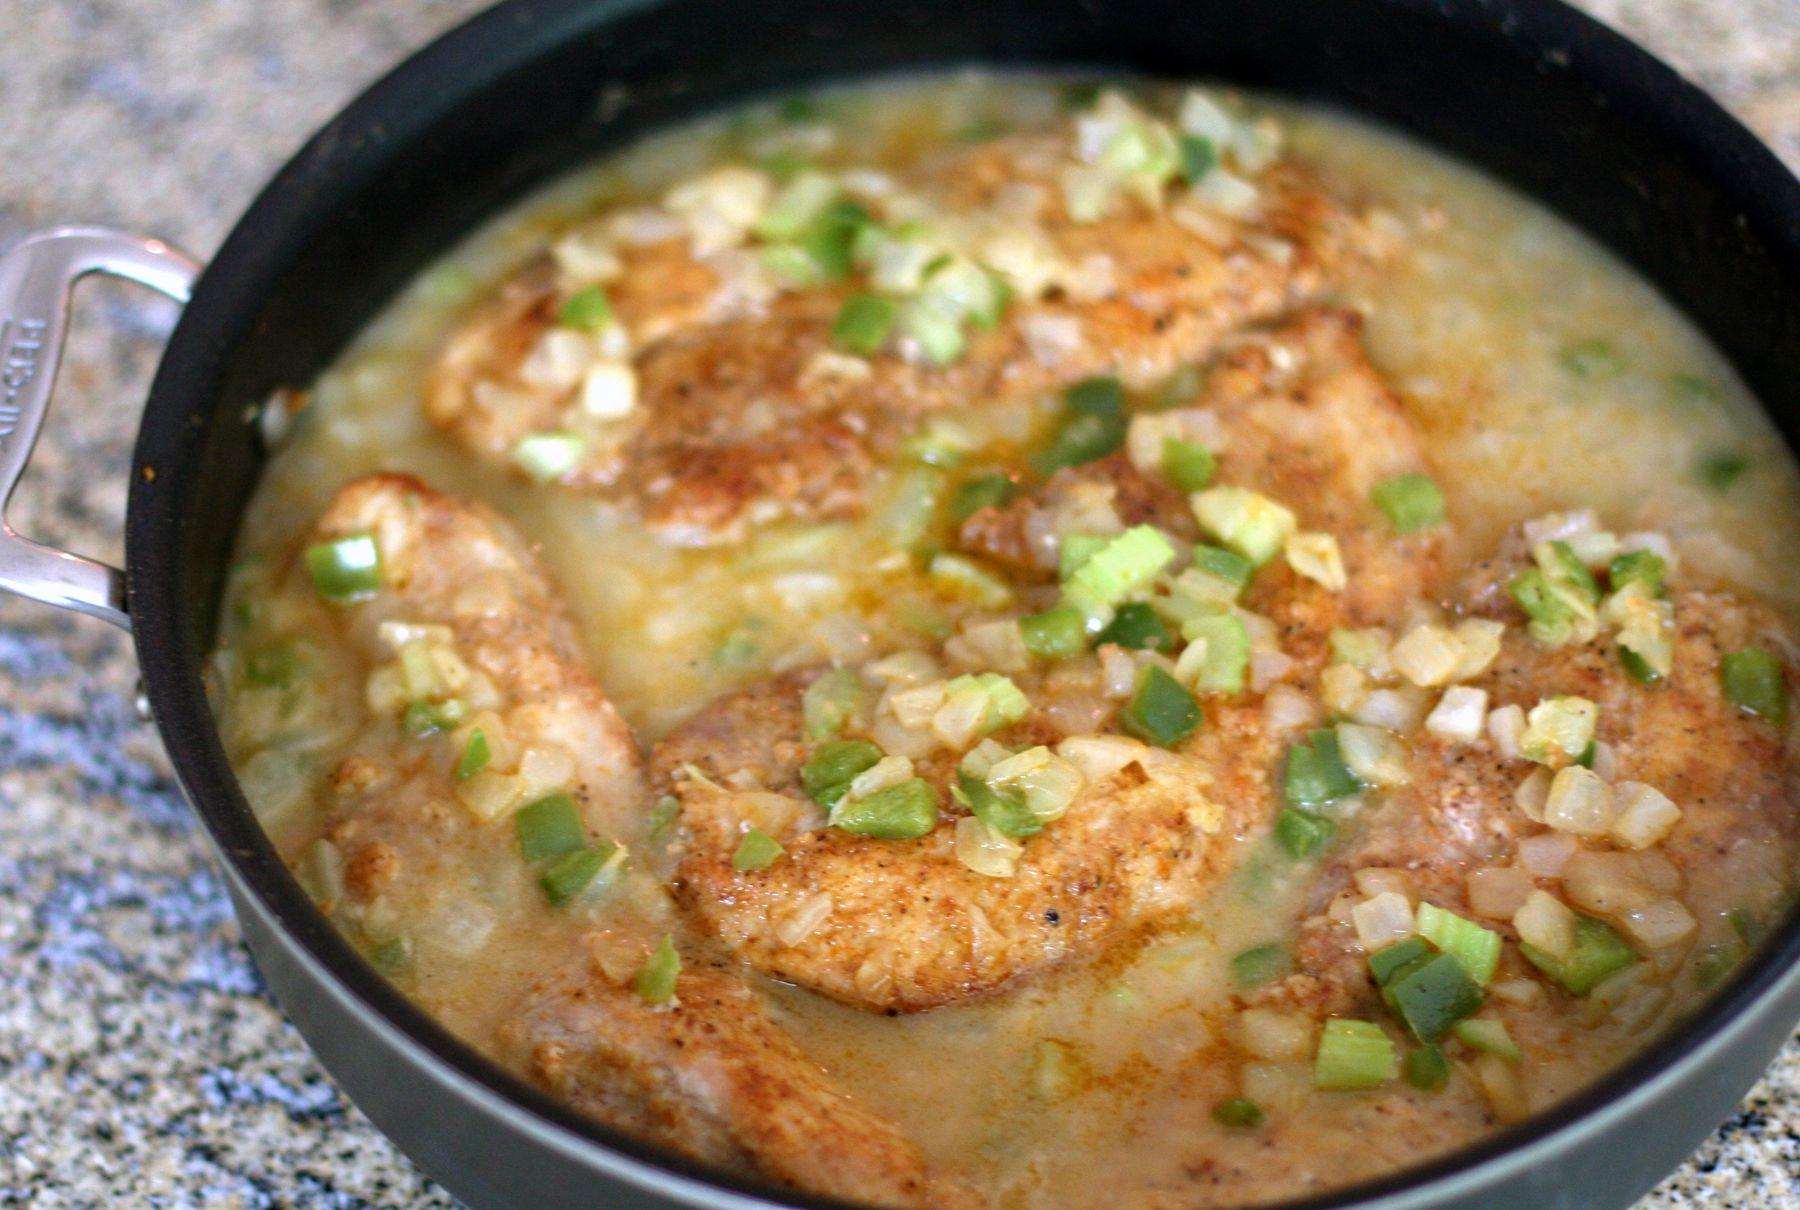 Cajun-Style Smothered Pork Chops